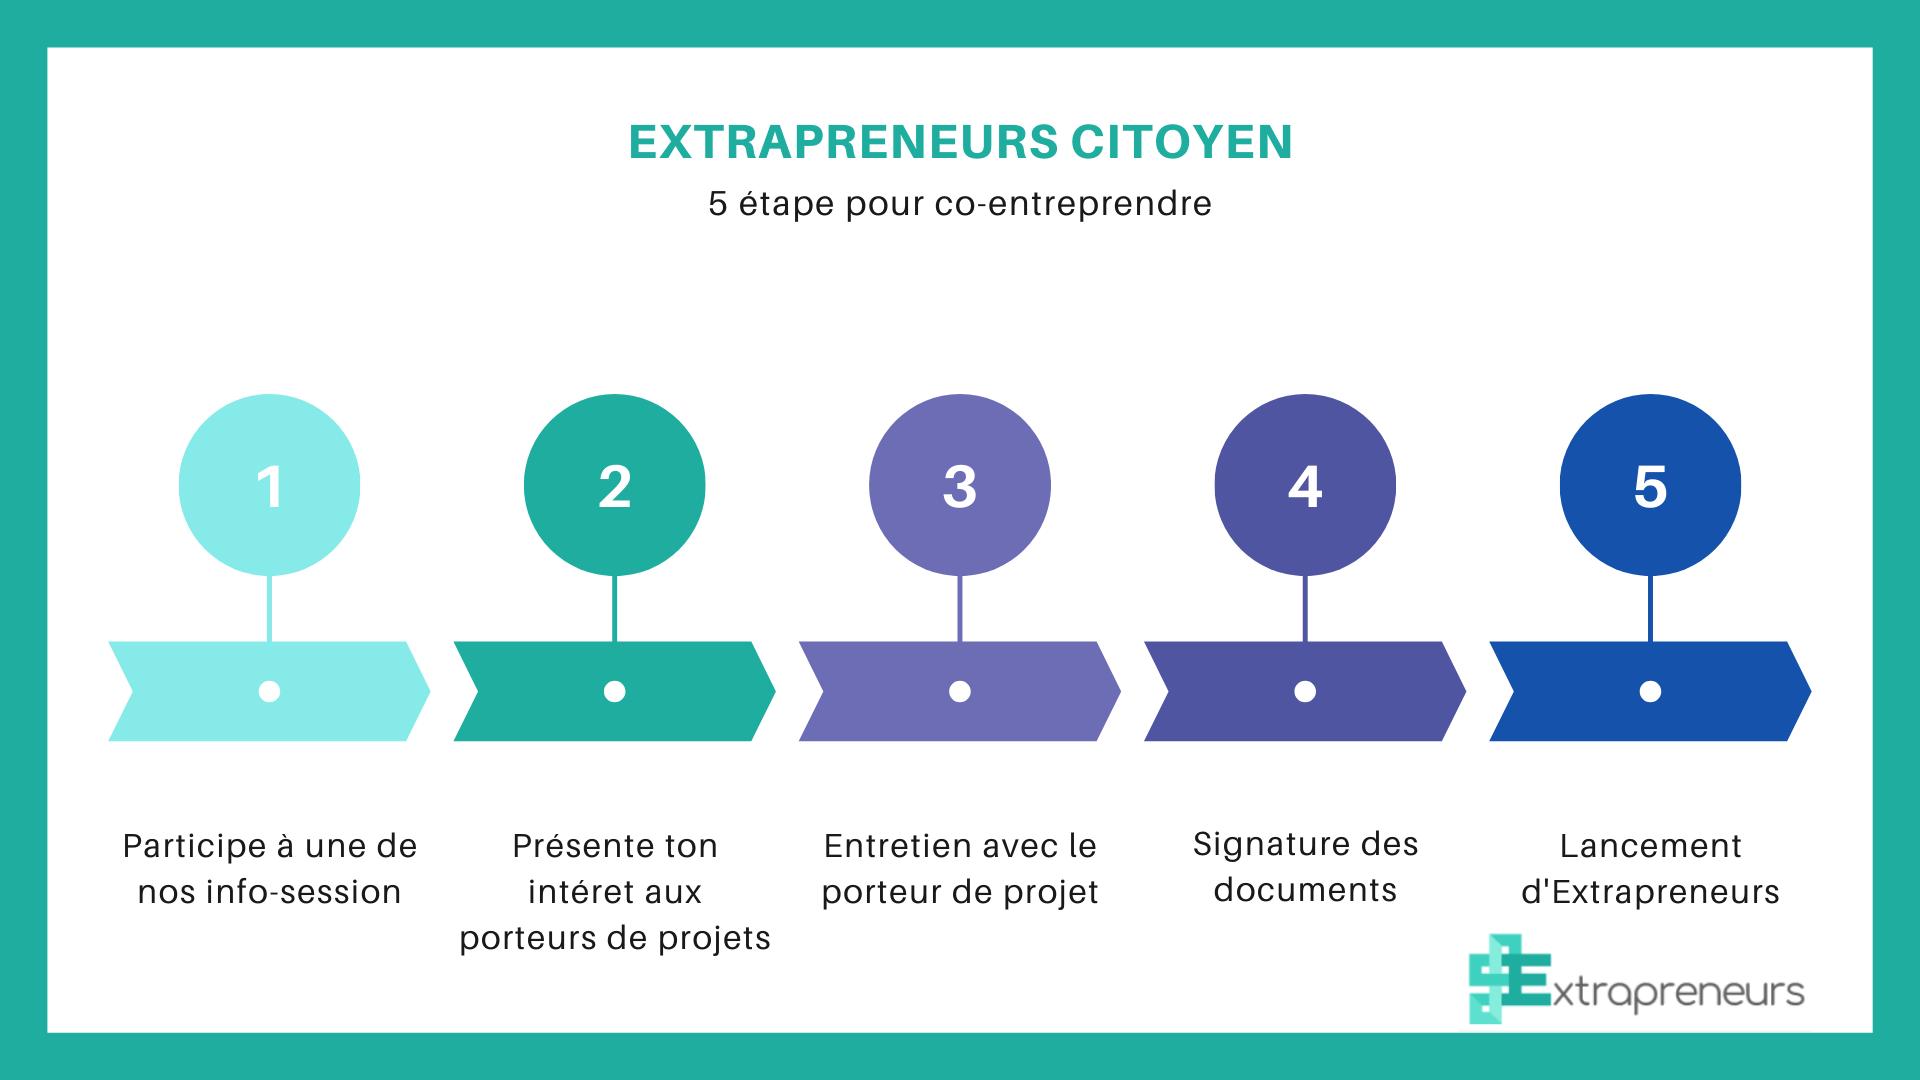 Inscription Extrapreneurs citoyen